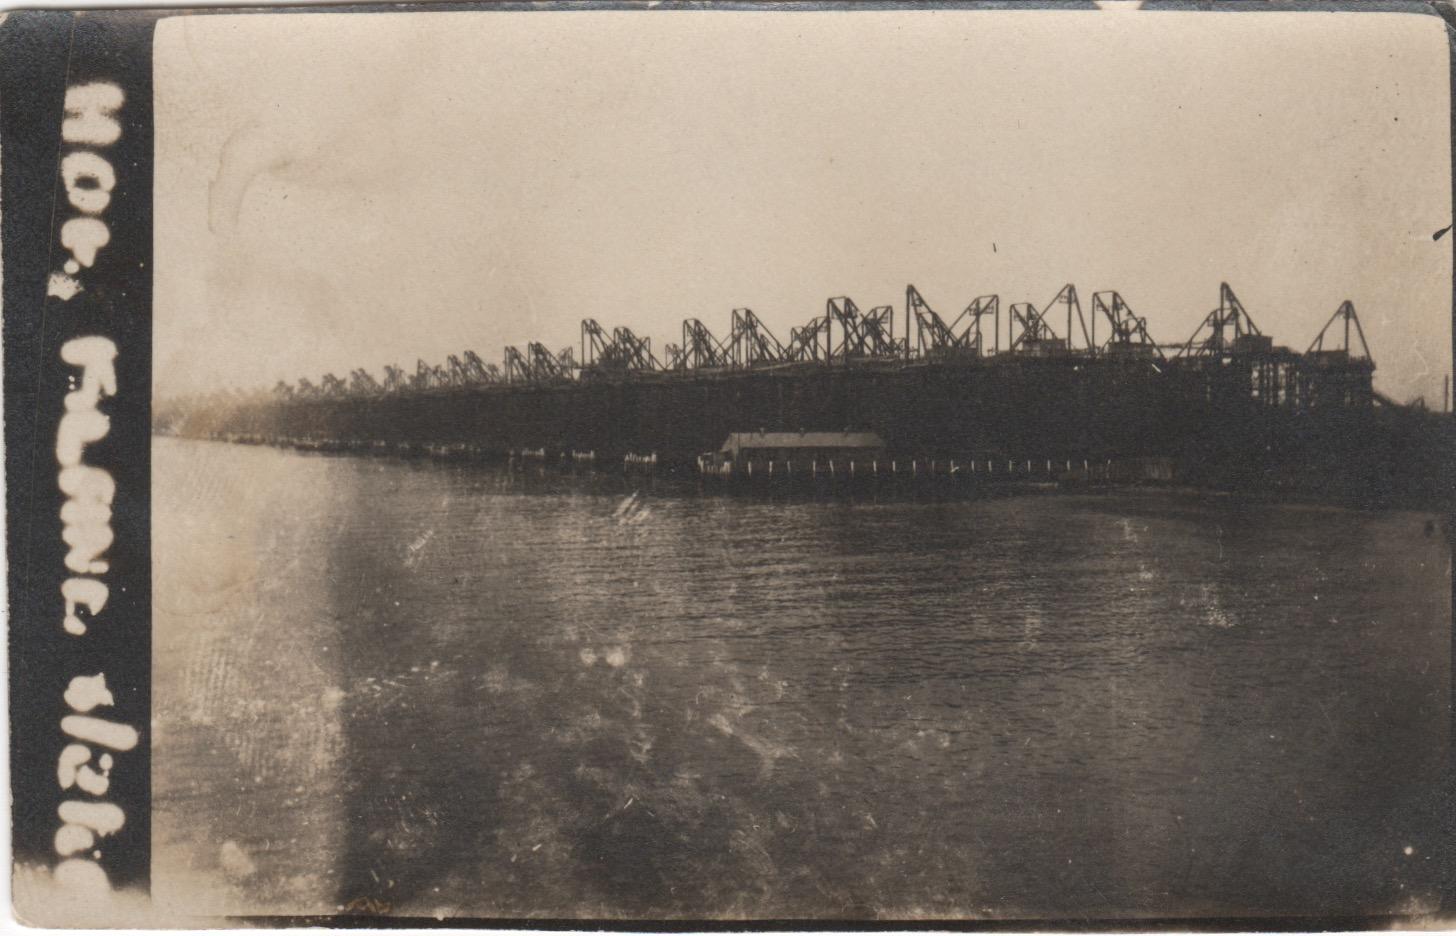 Hog Island Shipyard